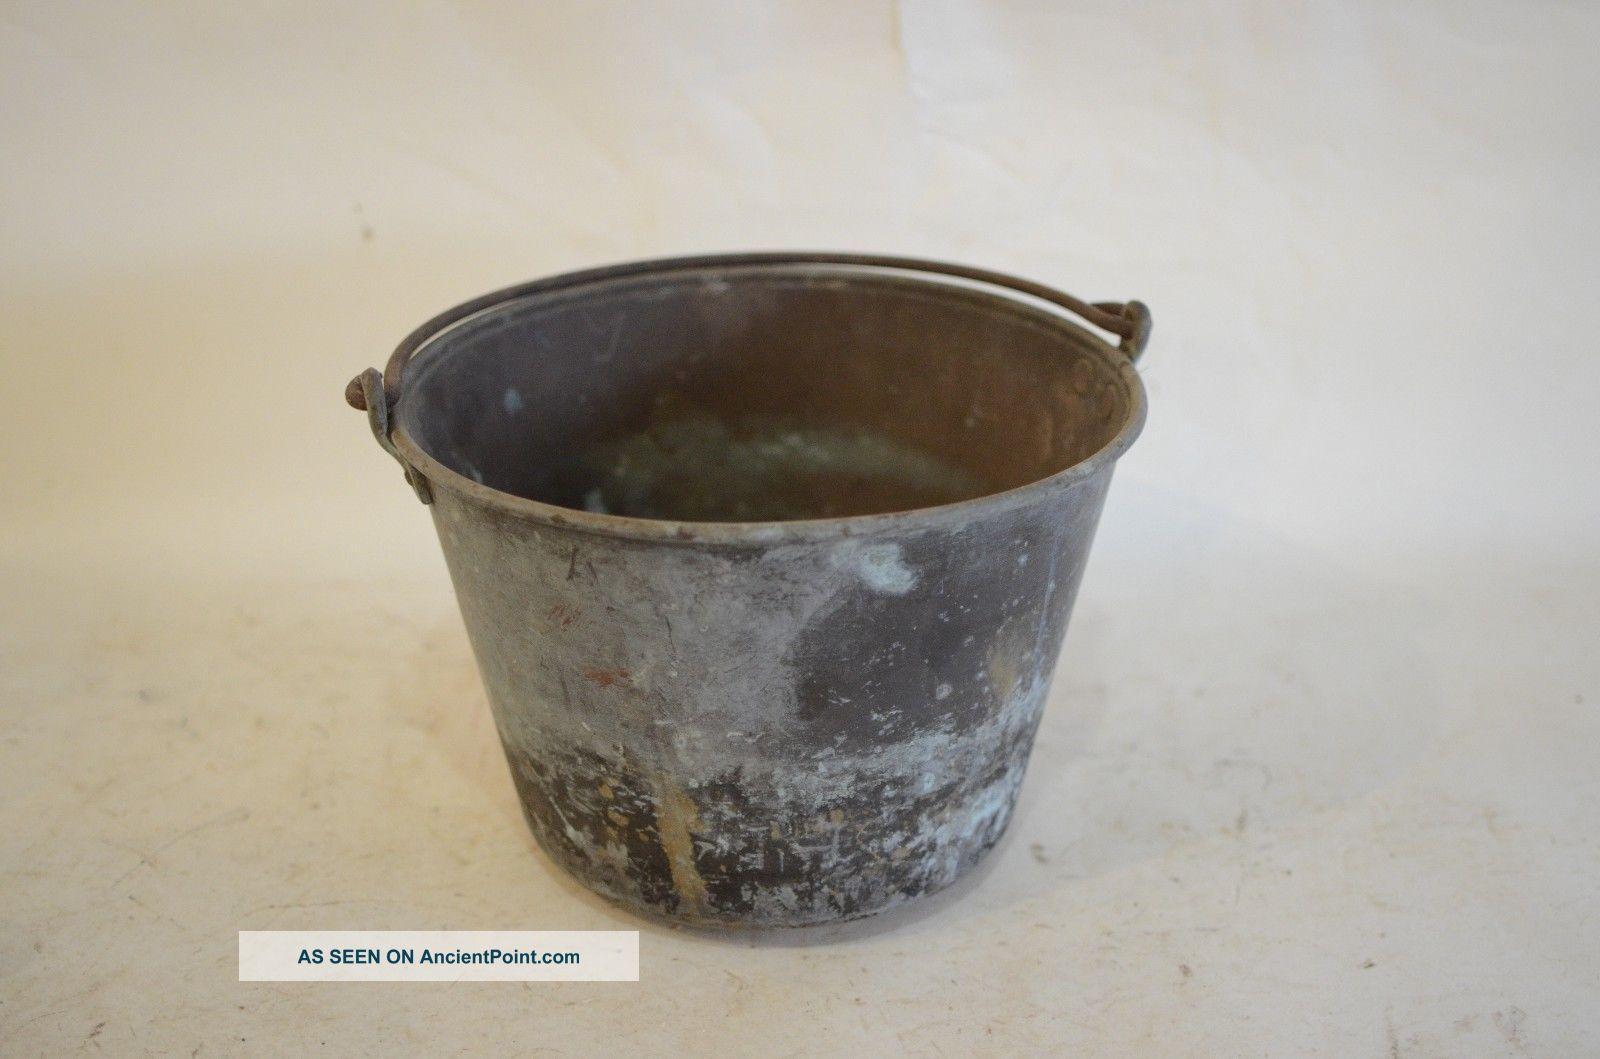 Ansonia Brass Cauldron Bucket Pail Kettle Pot Antique Fireplace Hearth Ware photo